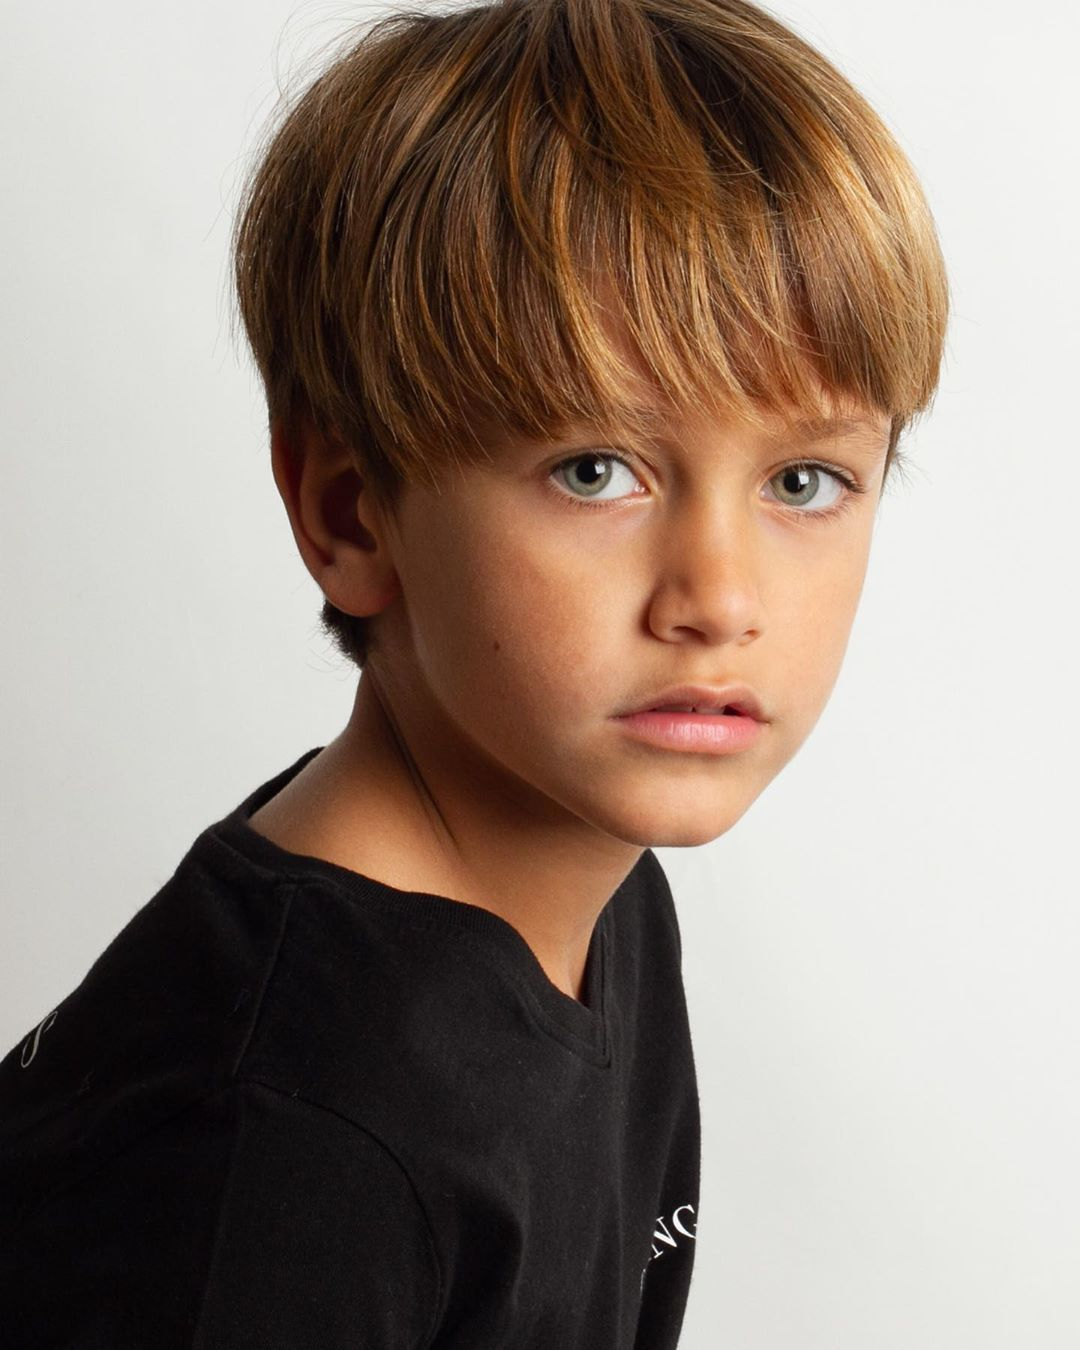 Gavin Casalegno Imdb Beauty Of Boys Kids Photography Boys Boys